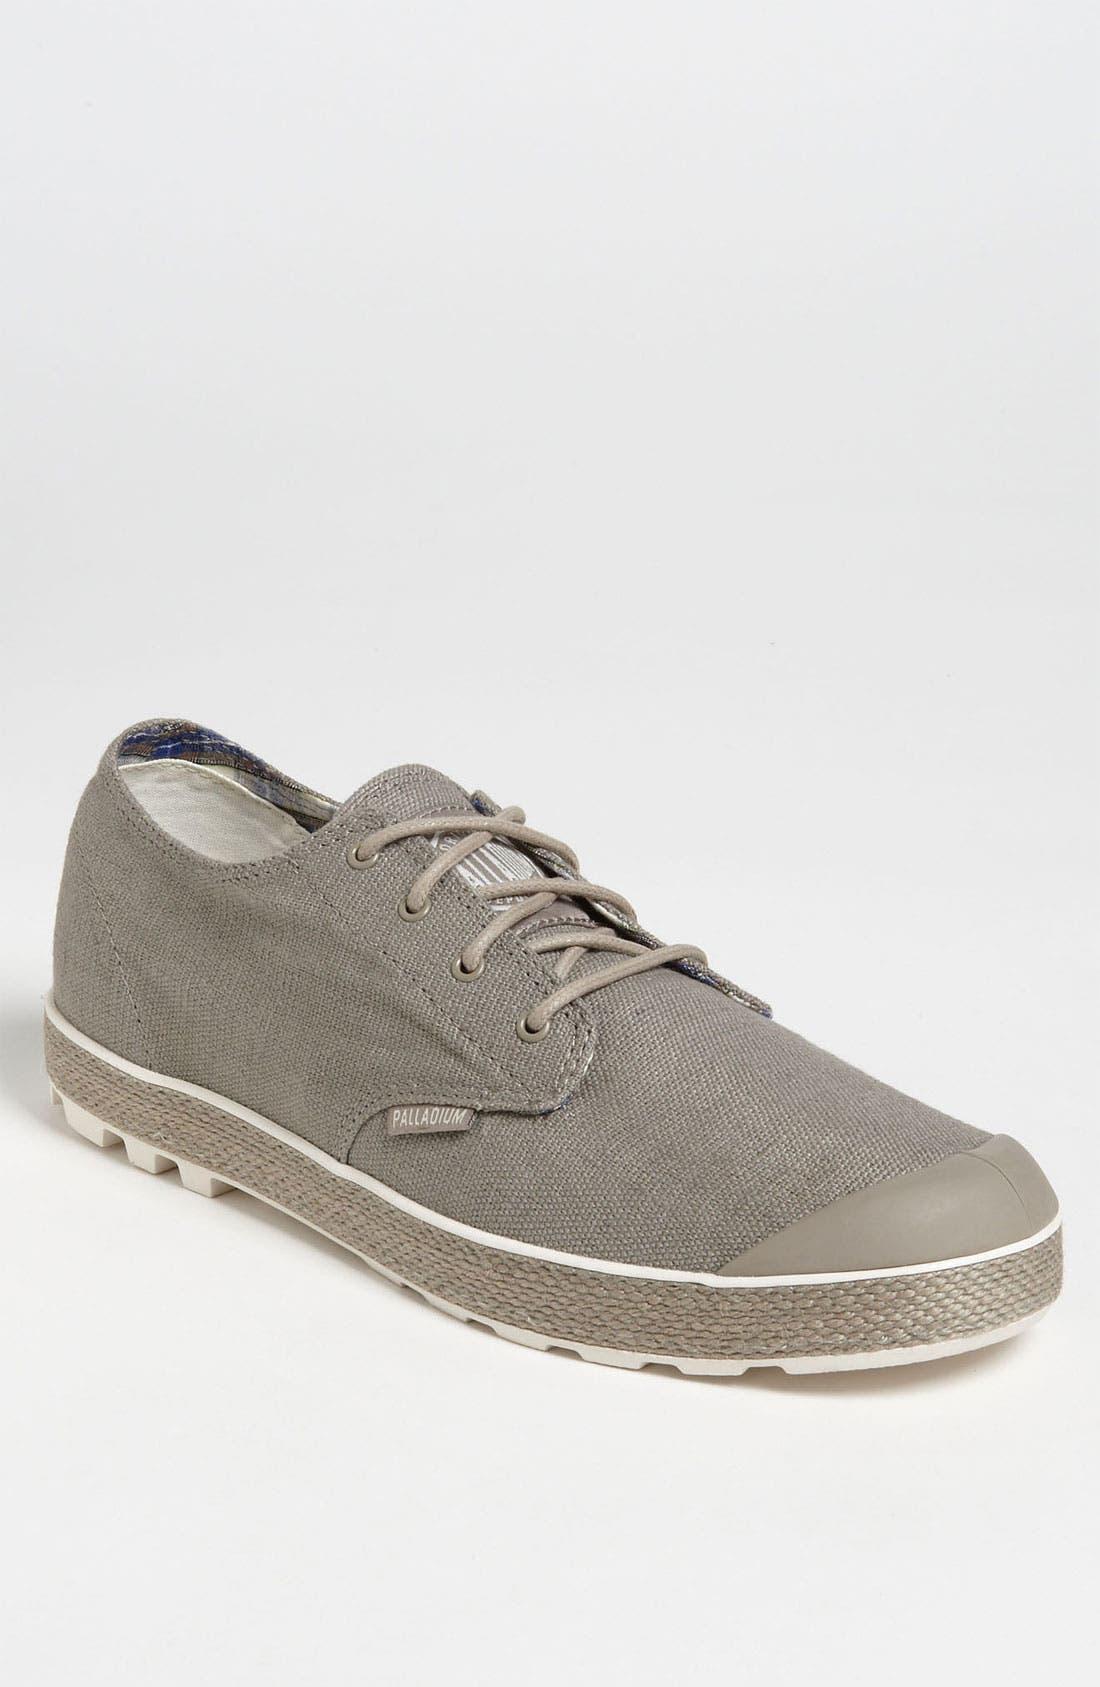 Main Image - Palladium Hemp Blend Sneaker